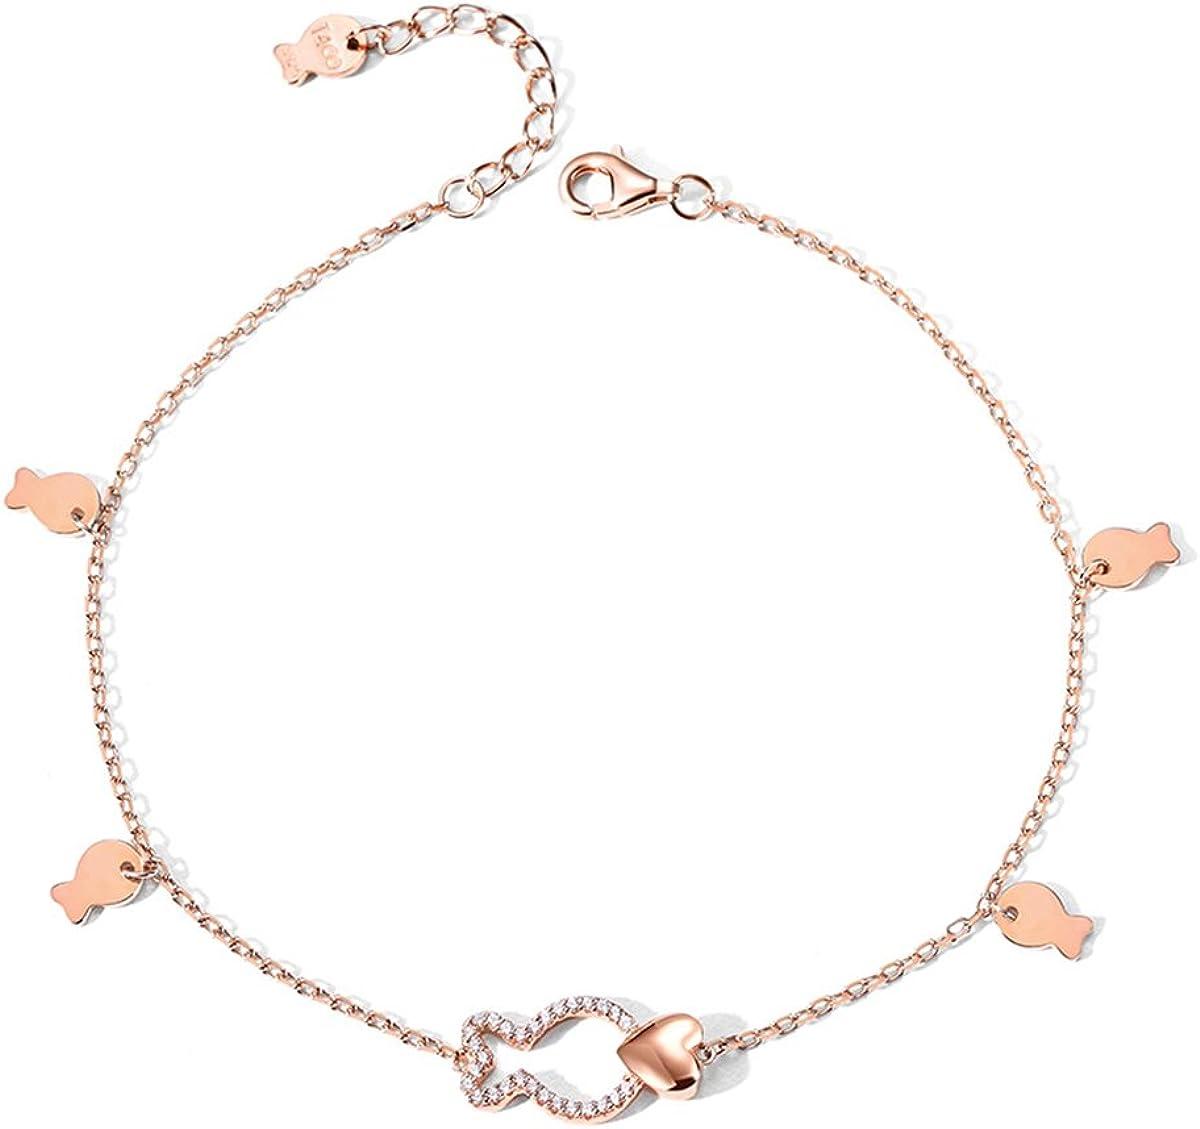 T400 925 Sterling Silver Anklet Rose Gold Clownfish Adjustable Link Bracelet for Women Love Gift with Cubic Zirconia